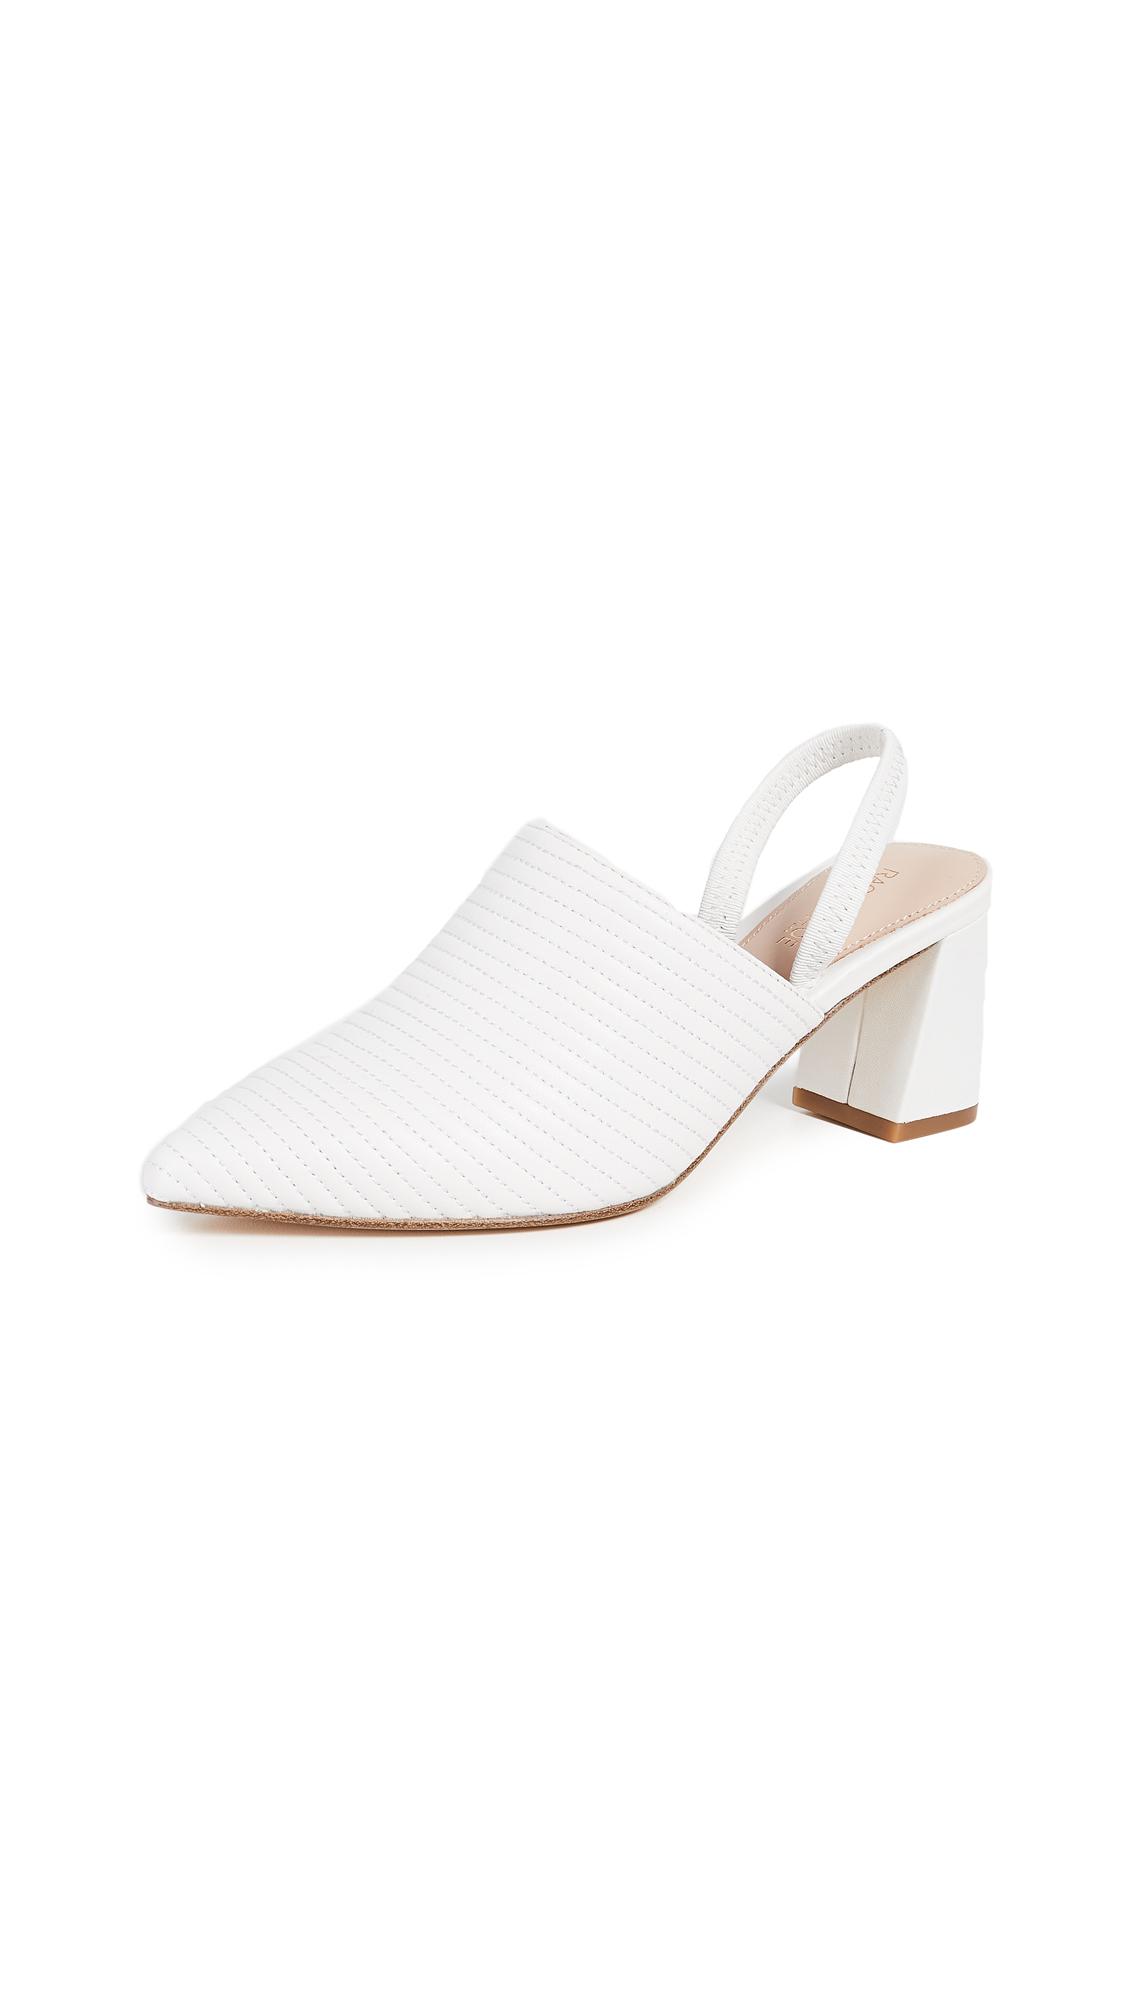 Rachel Zoe Liza Block Heel Mules - White